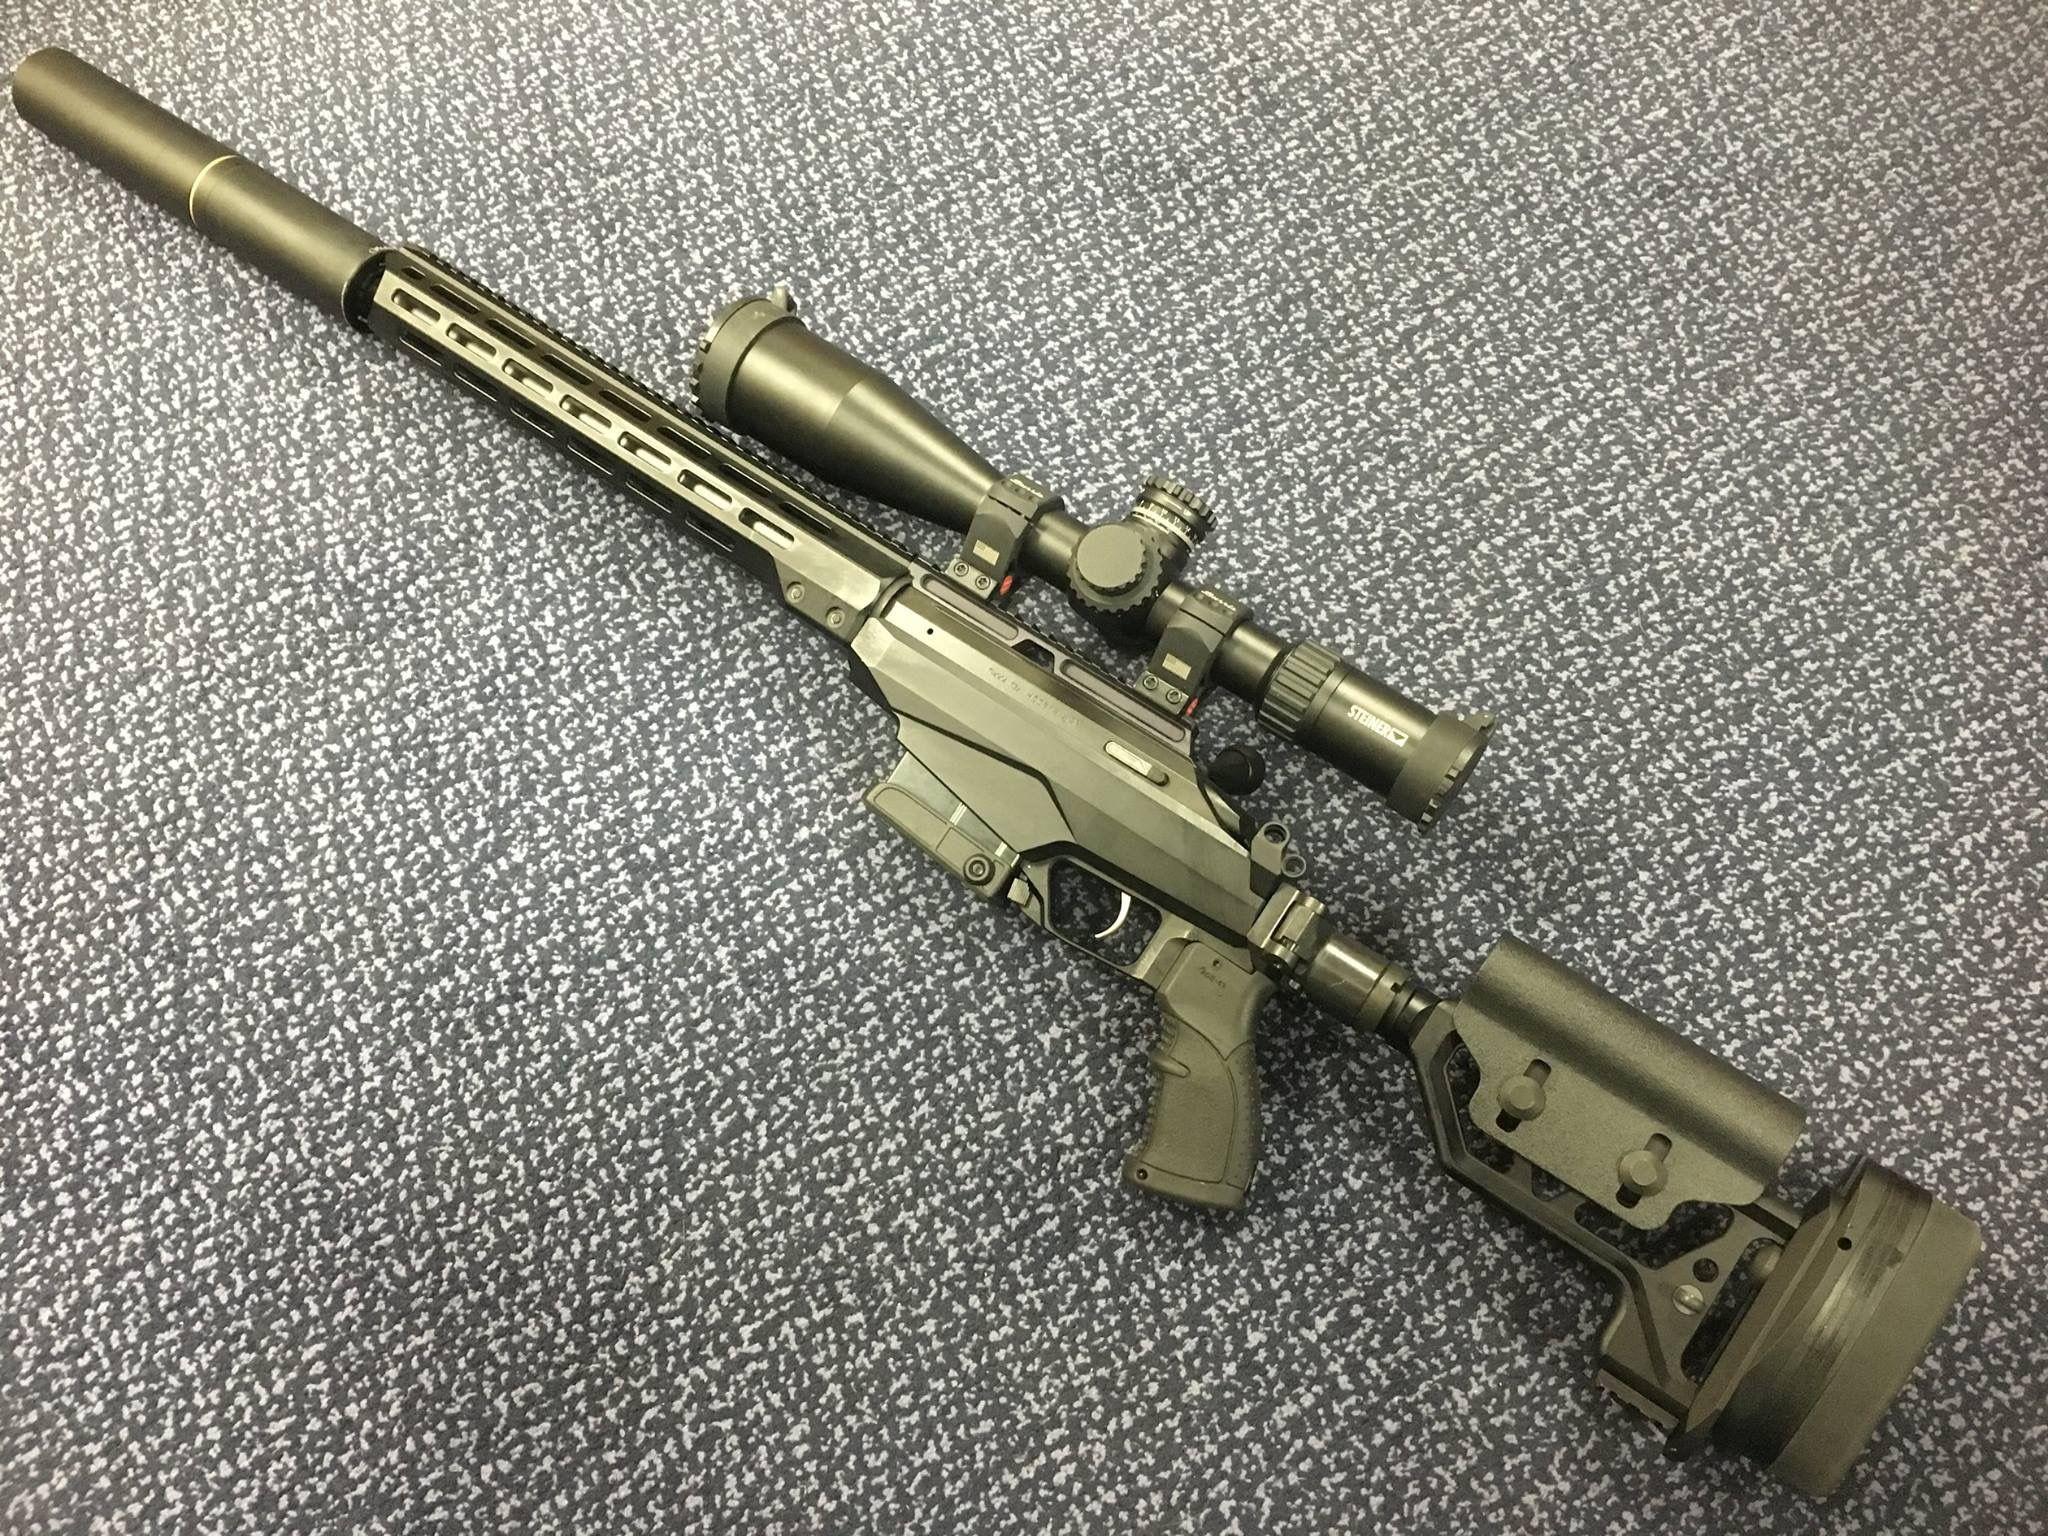 Tikka T3x TAC A1 | Guns | Pinterest | Hunting rifles, Guns and Firearms